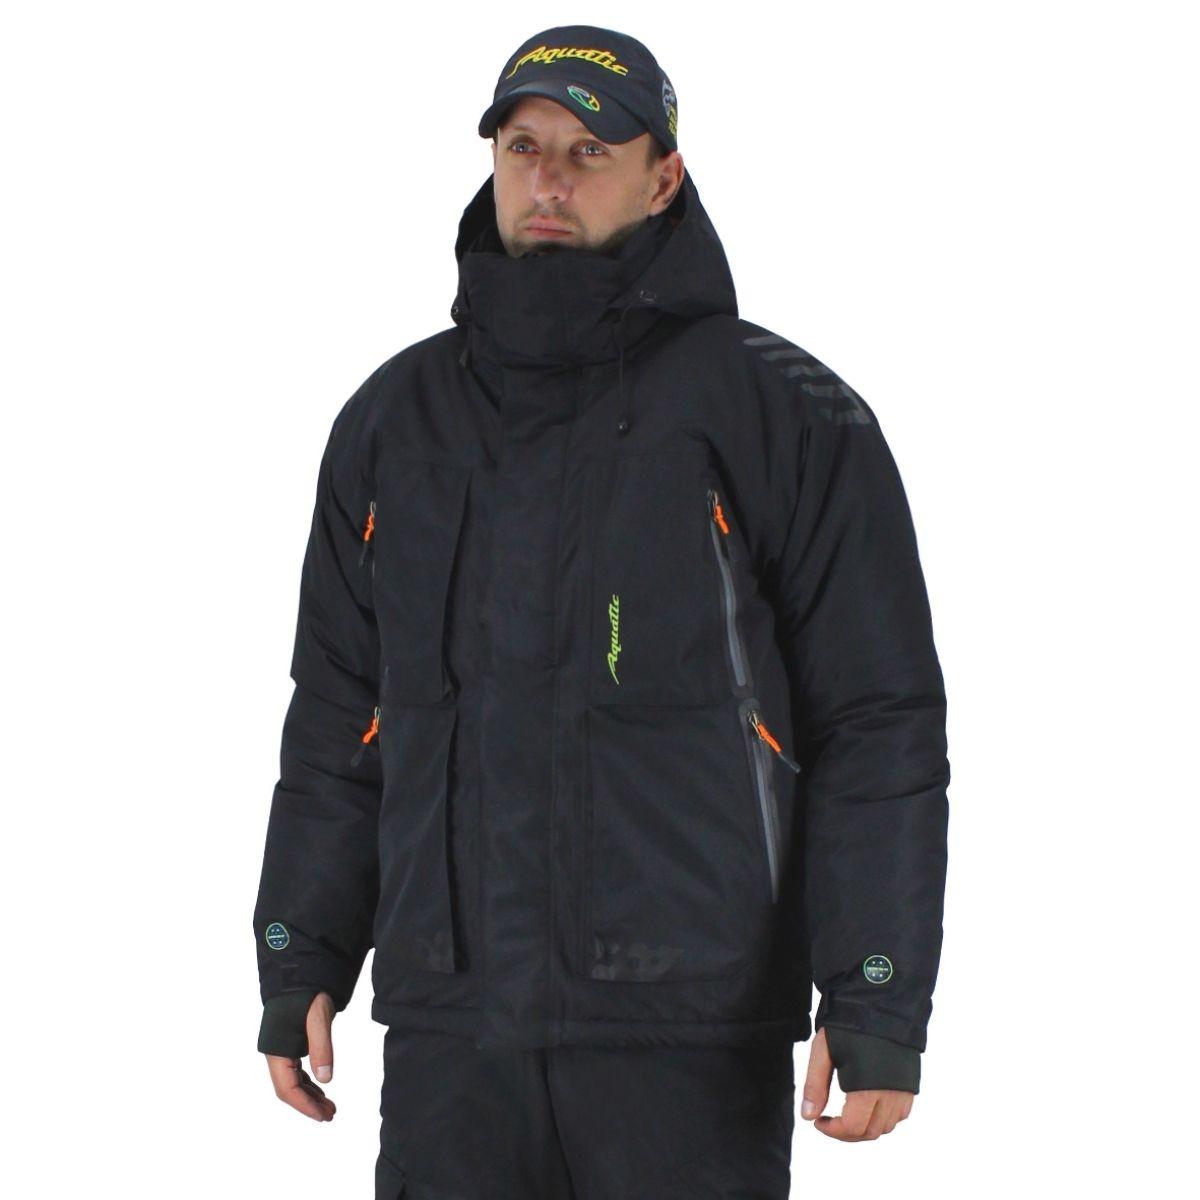 Winter Jacket Aquatic кк-14ч, Black кк-14ч 54-56